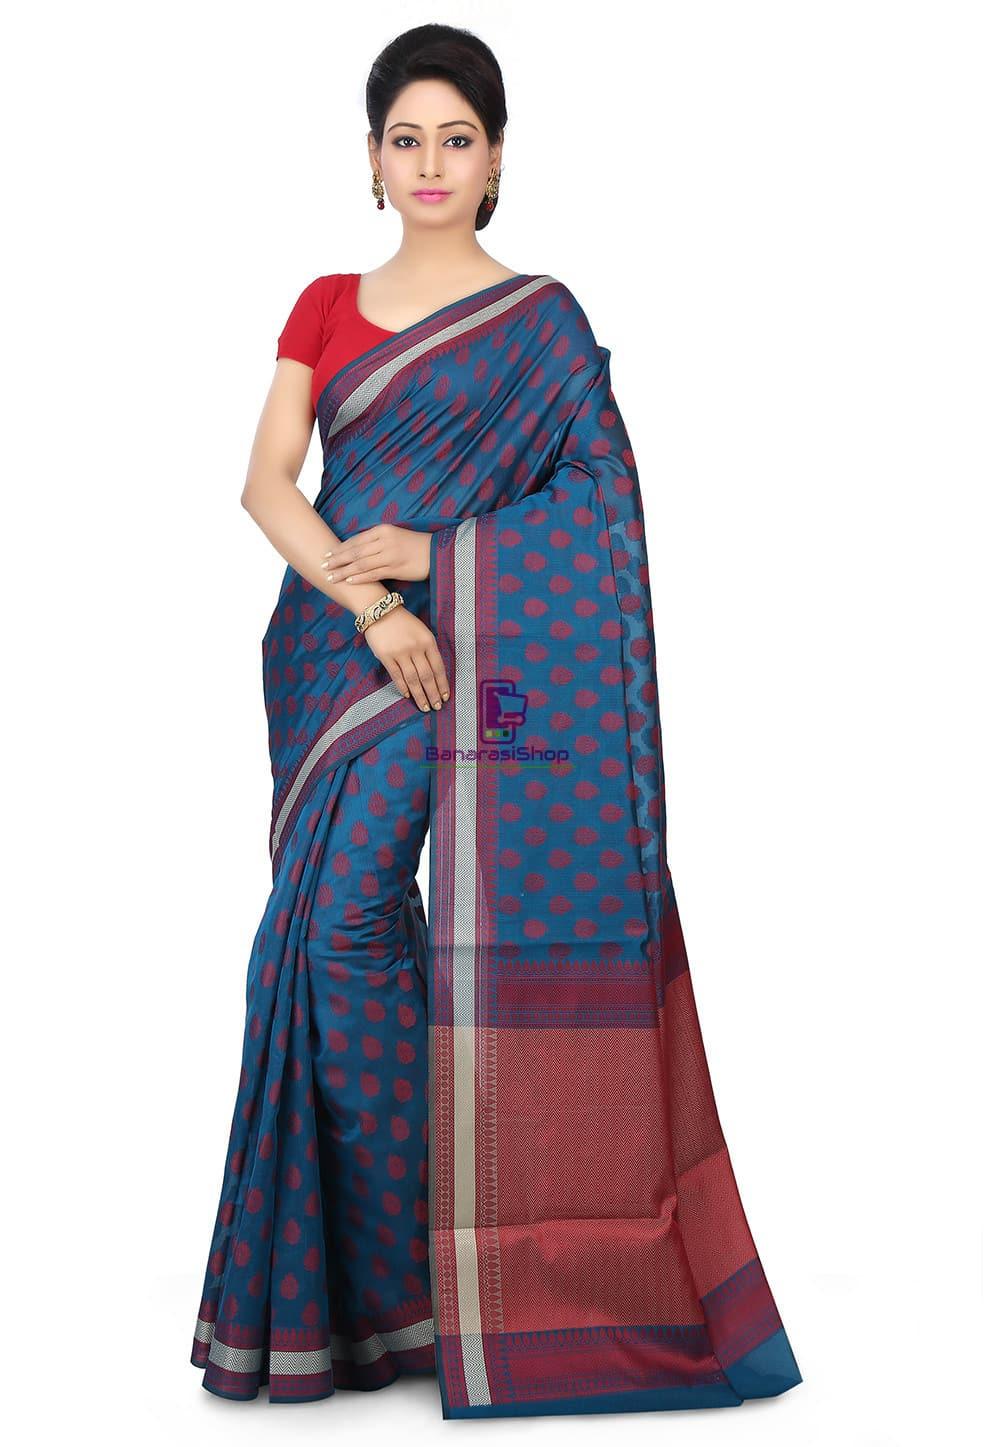 Woven Banarasi Chanderi Silk Saree in Teal Blue 1